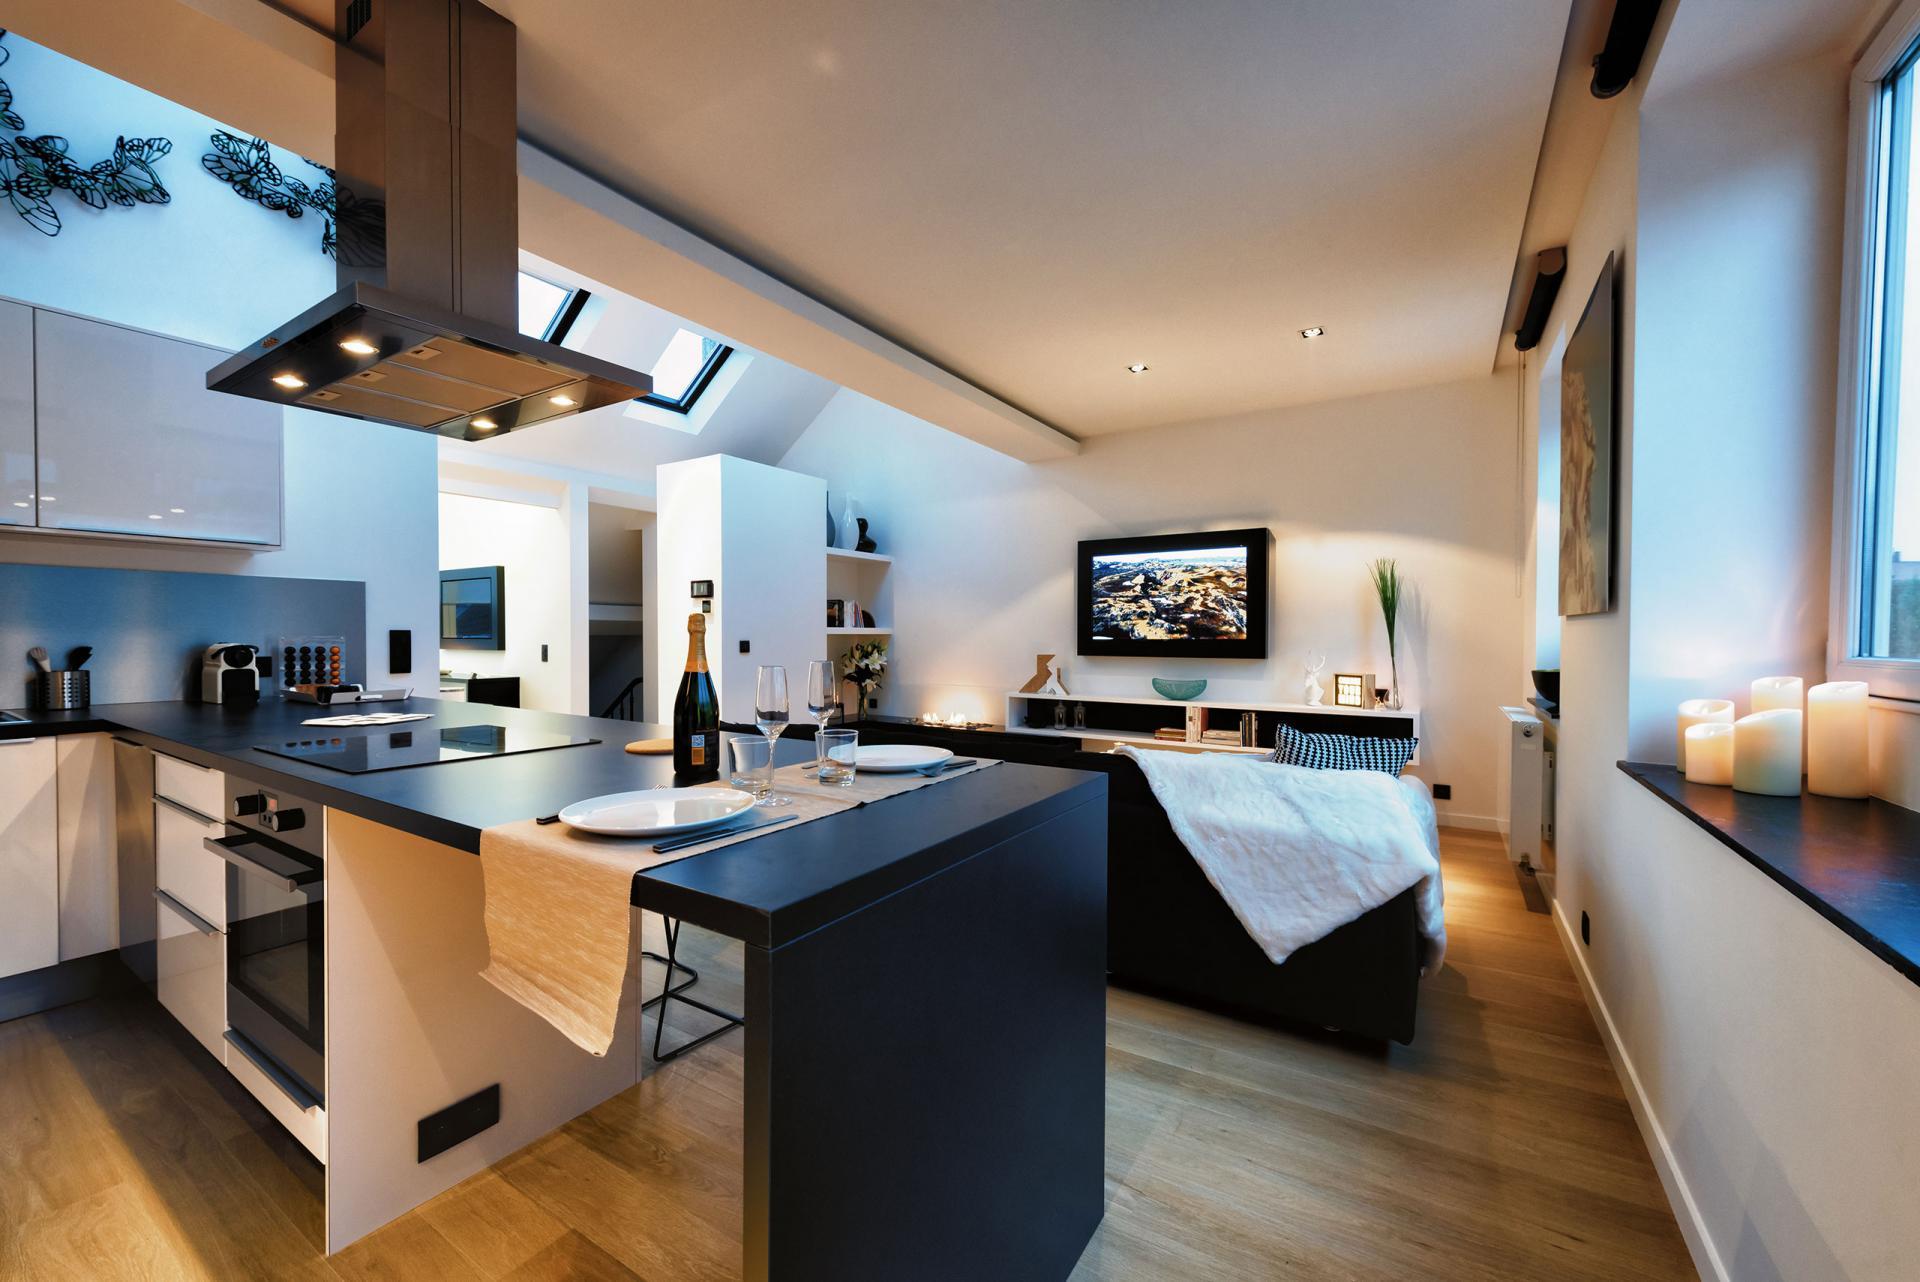 Kitchen facilities at Amazone Charles Apartments - Citybase Apartments